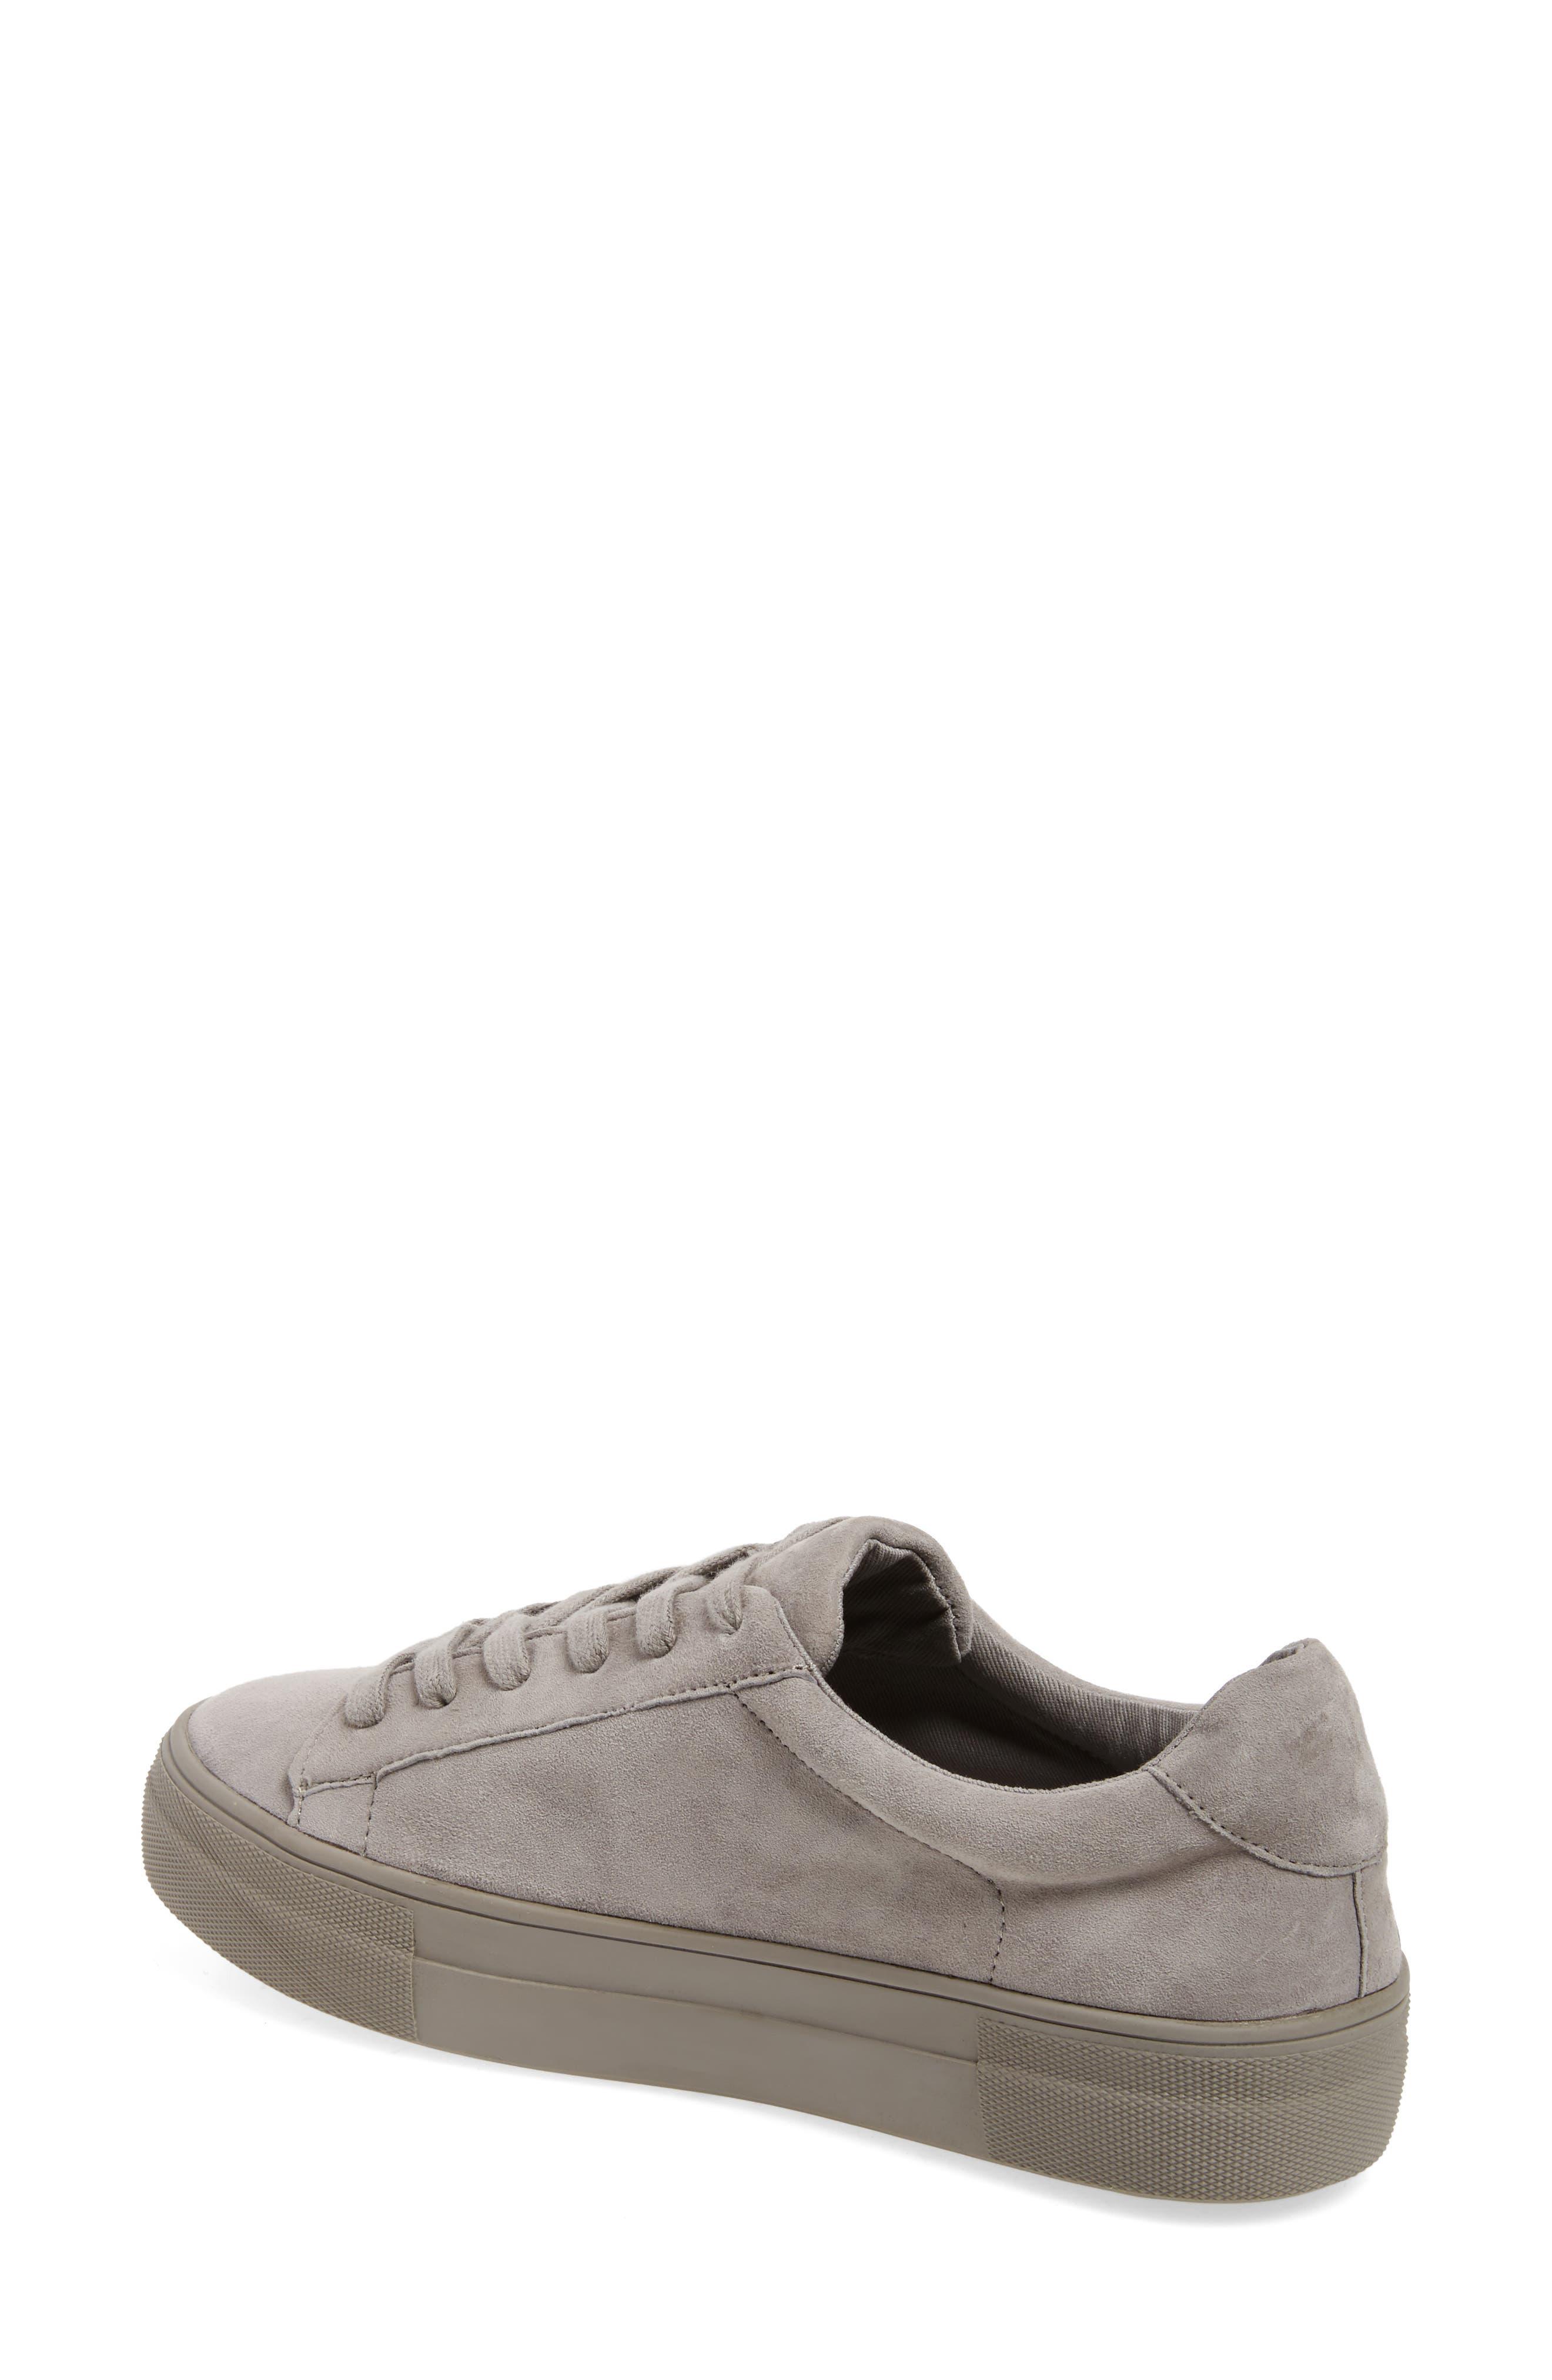 Gisela Low Top Sneaker,                             Alternate thumbnail 2, color,                             020